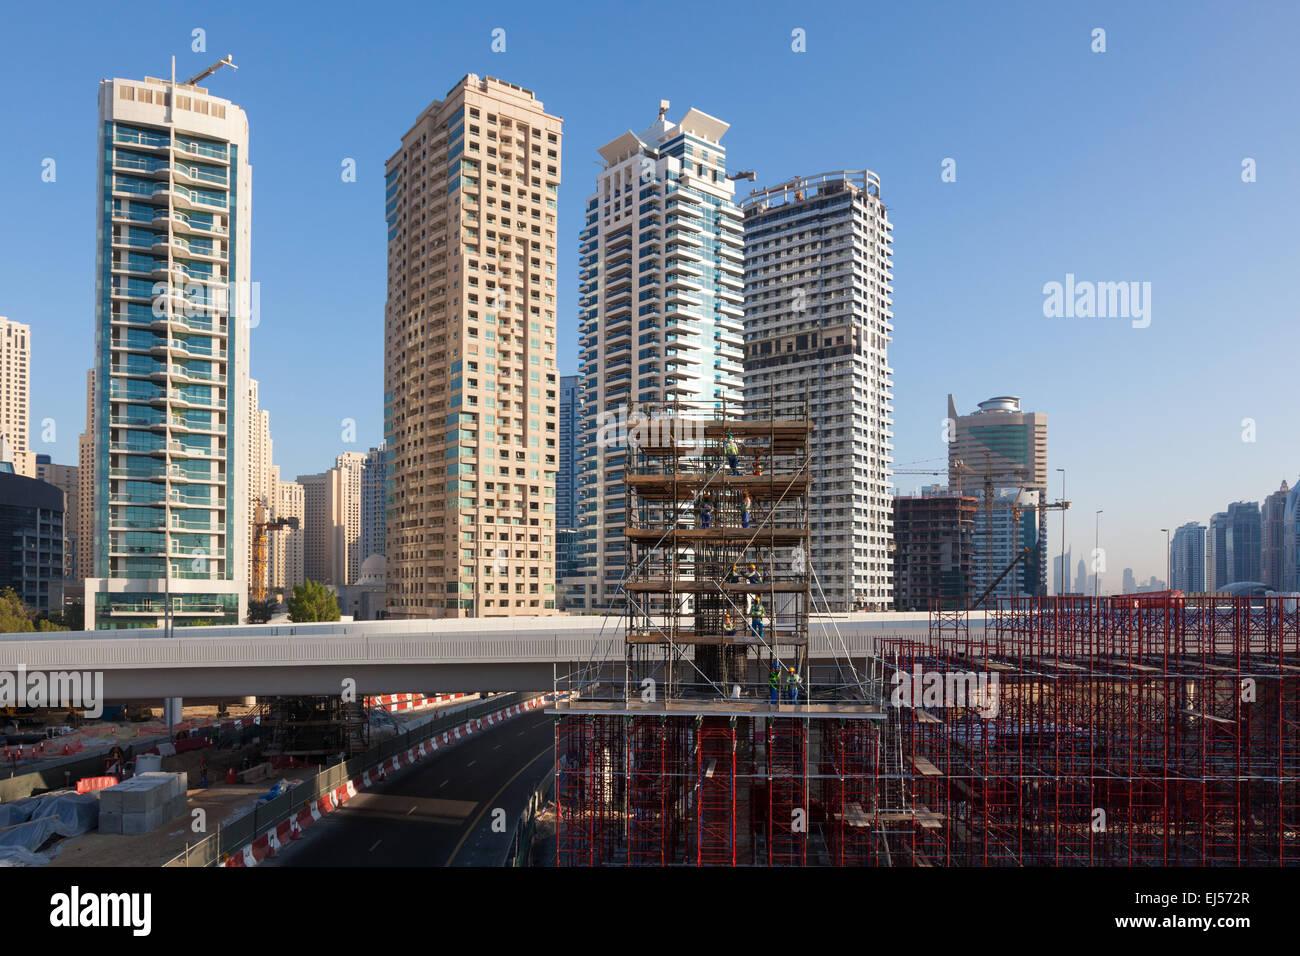 Construction Site in Dubai Stock Photo